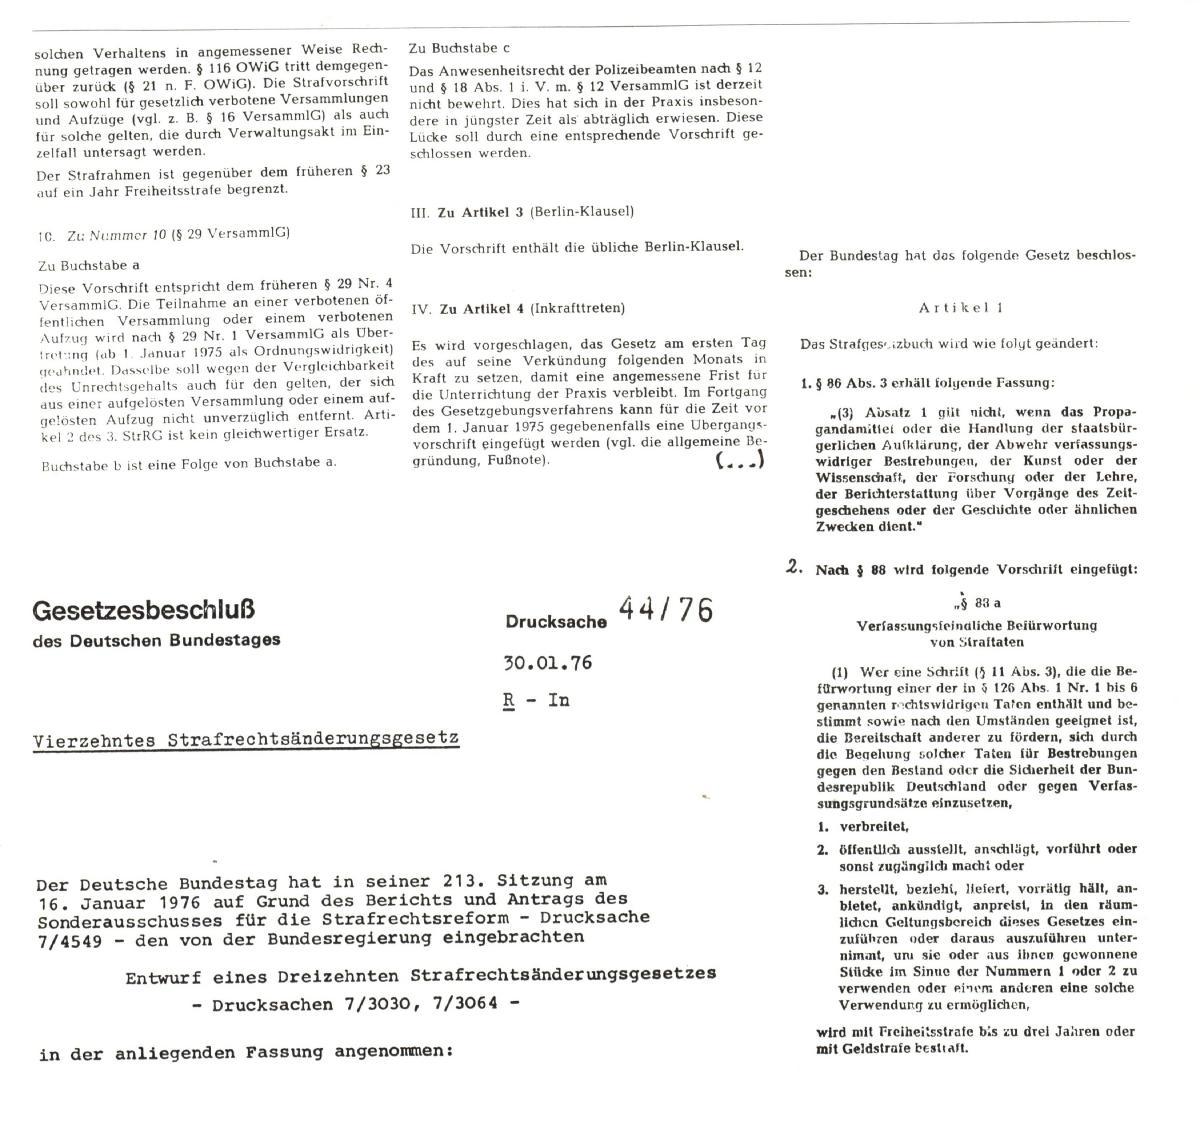 REP_VLB_1976_Die_Zensurgesetze_56